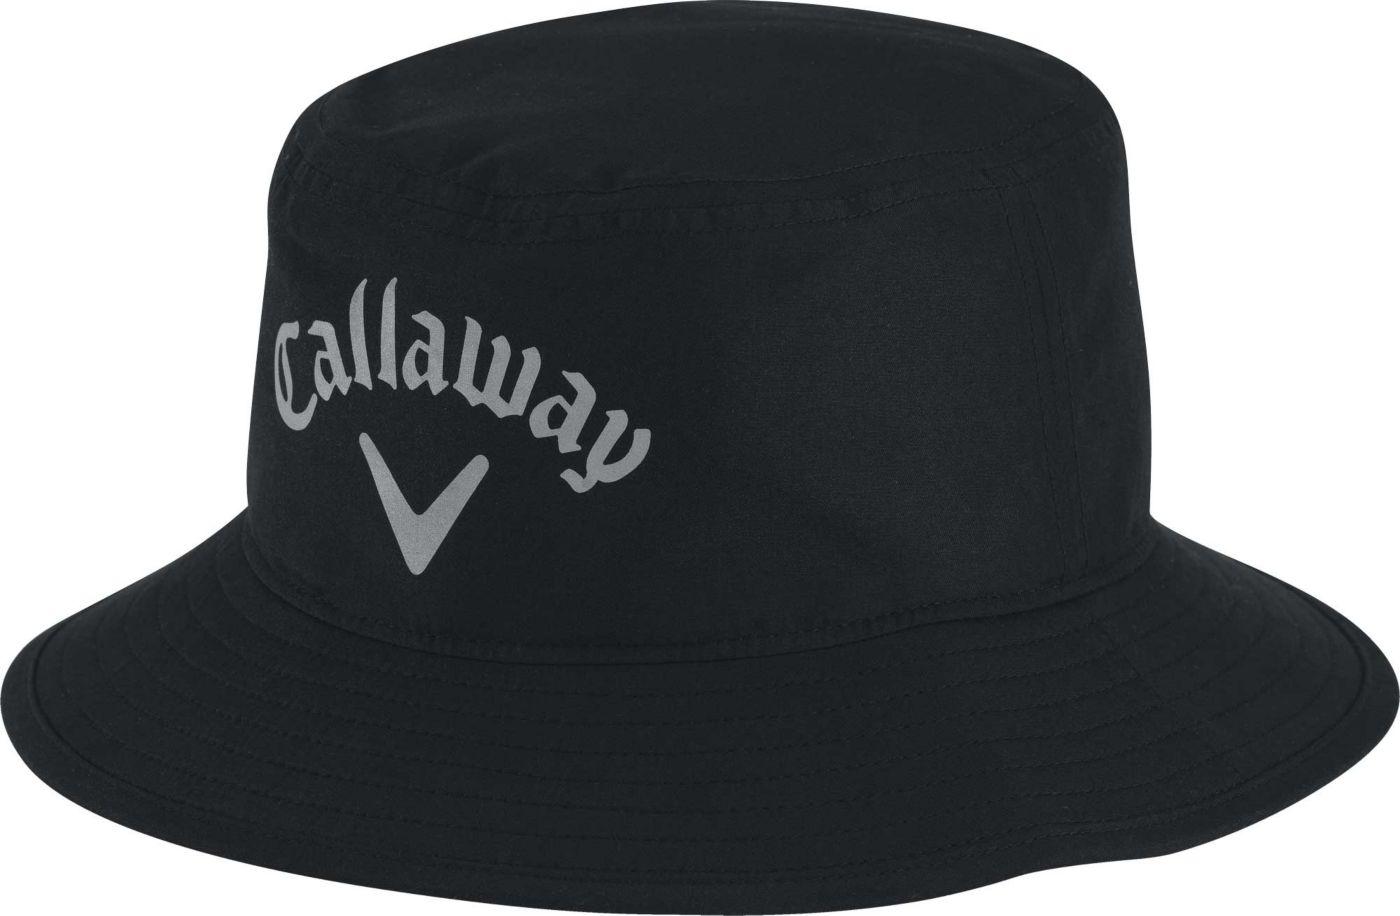 Callaway Men's Aqua Dry Golf Bucket Hat